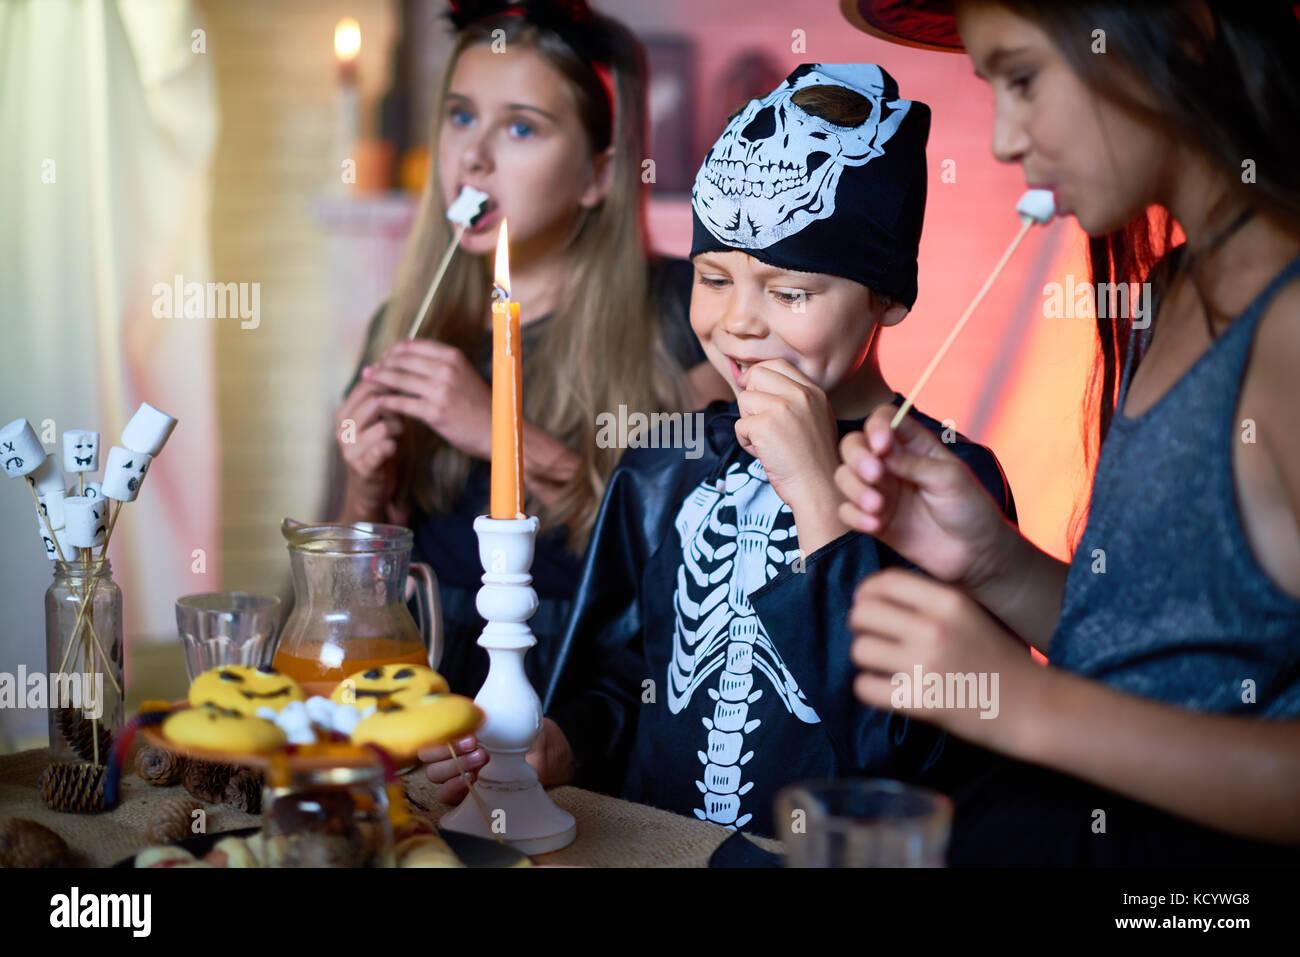 Portrait of handsome little boy wearing skeleton costume enjoying tasty fried marshmallows while celebrating Halloween - Stock Image